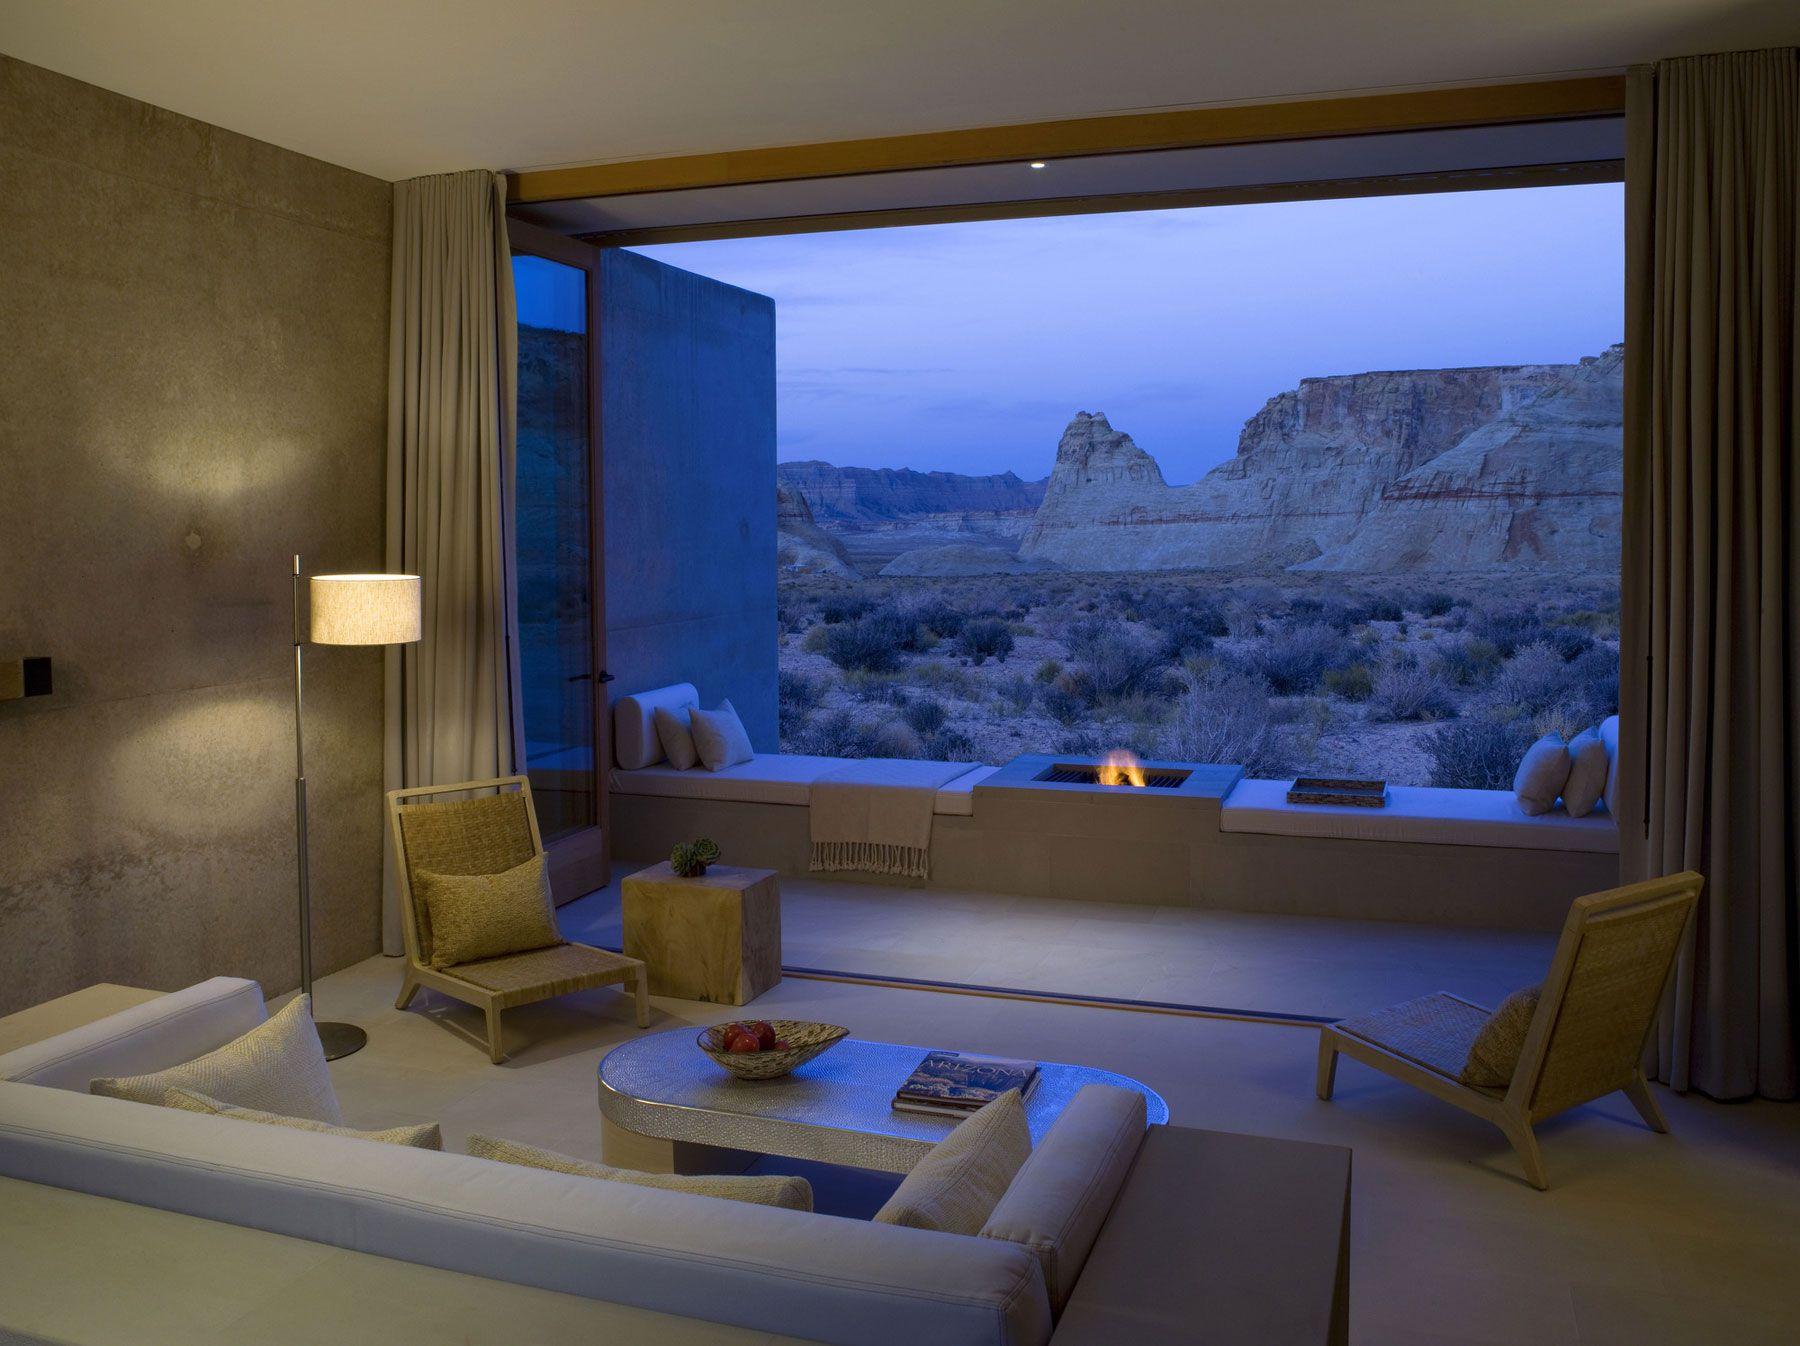 Amangiri-Luxury-Resort-Hotel-in-Canyon-Point-08-2